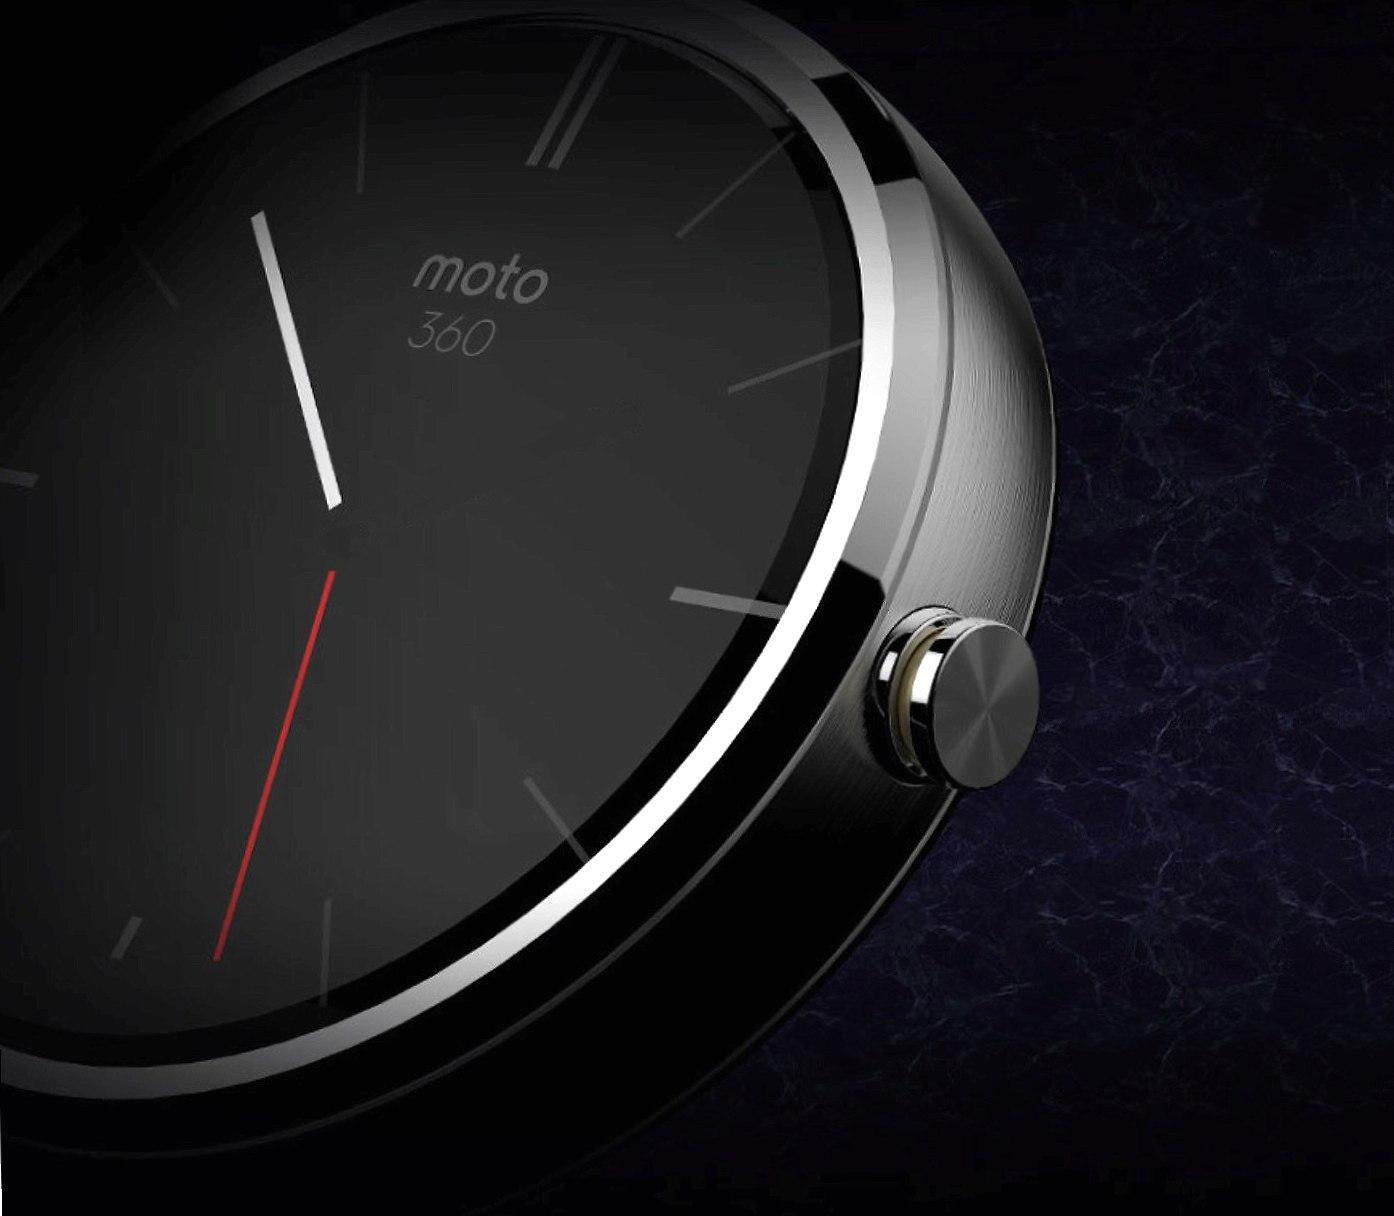 Motorola Moto X wallpapers HD quality